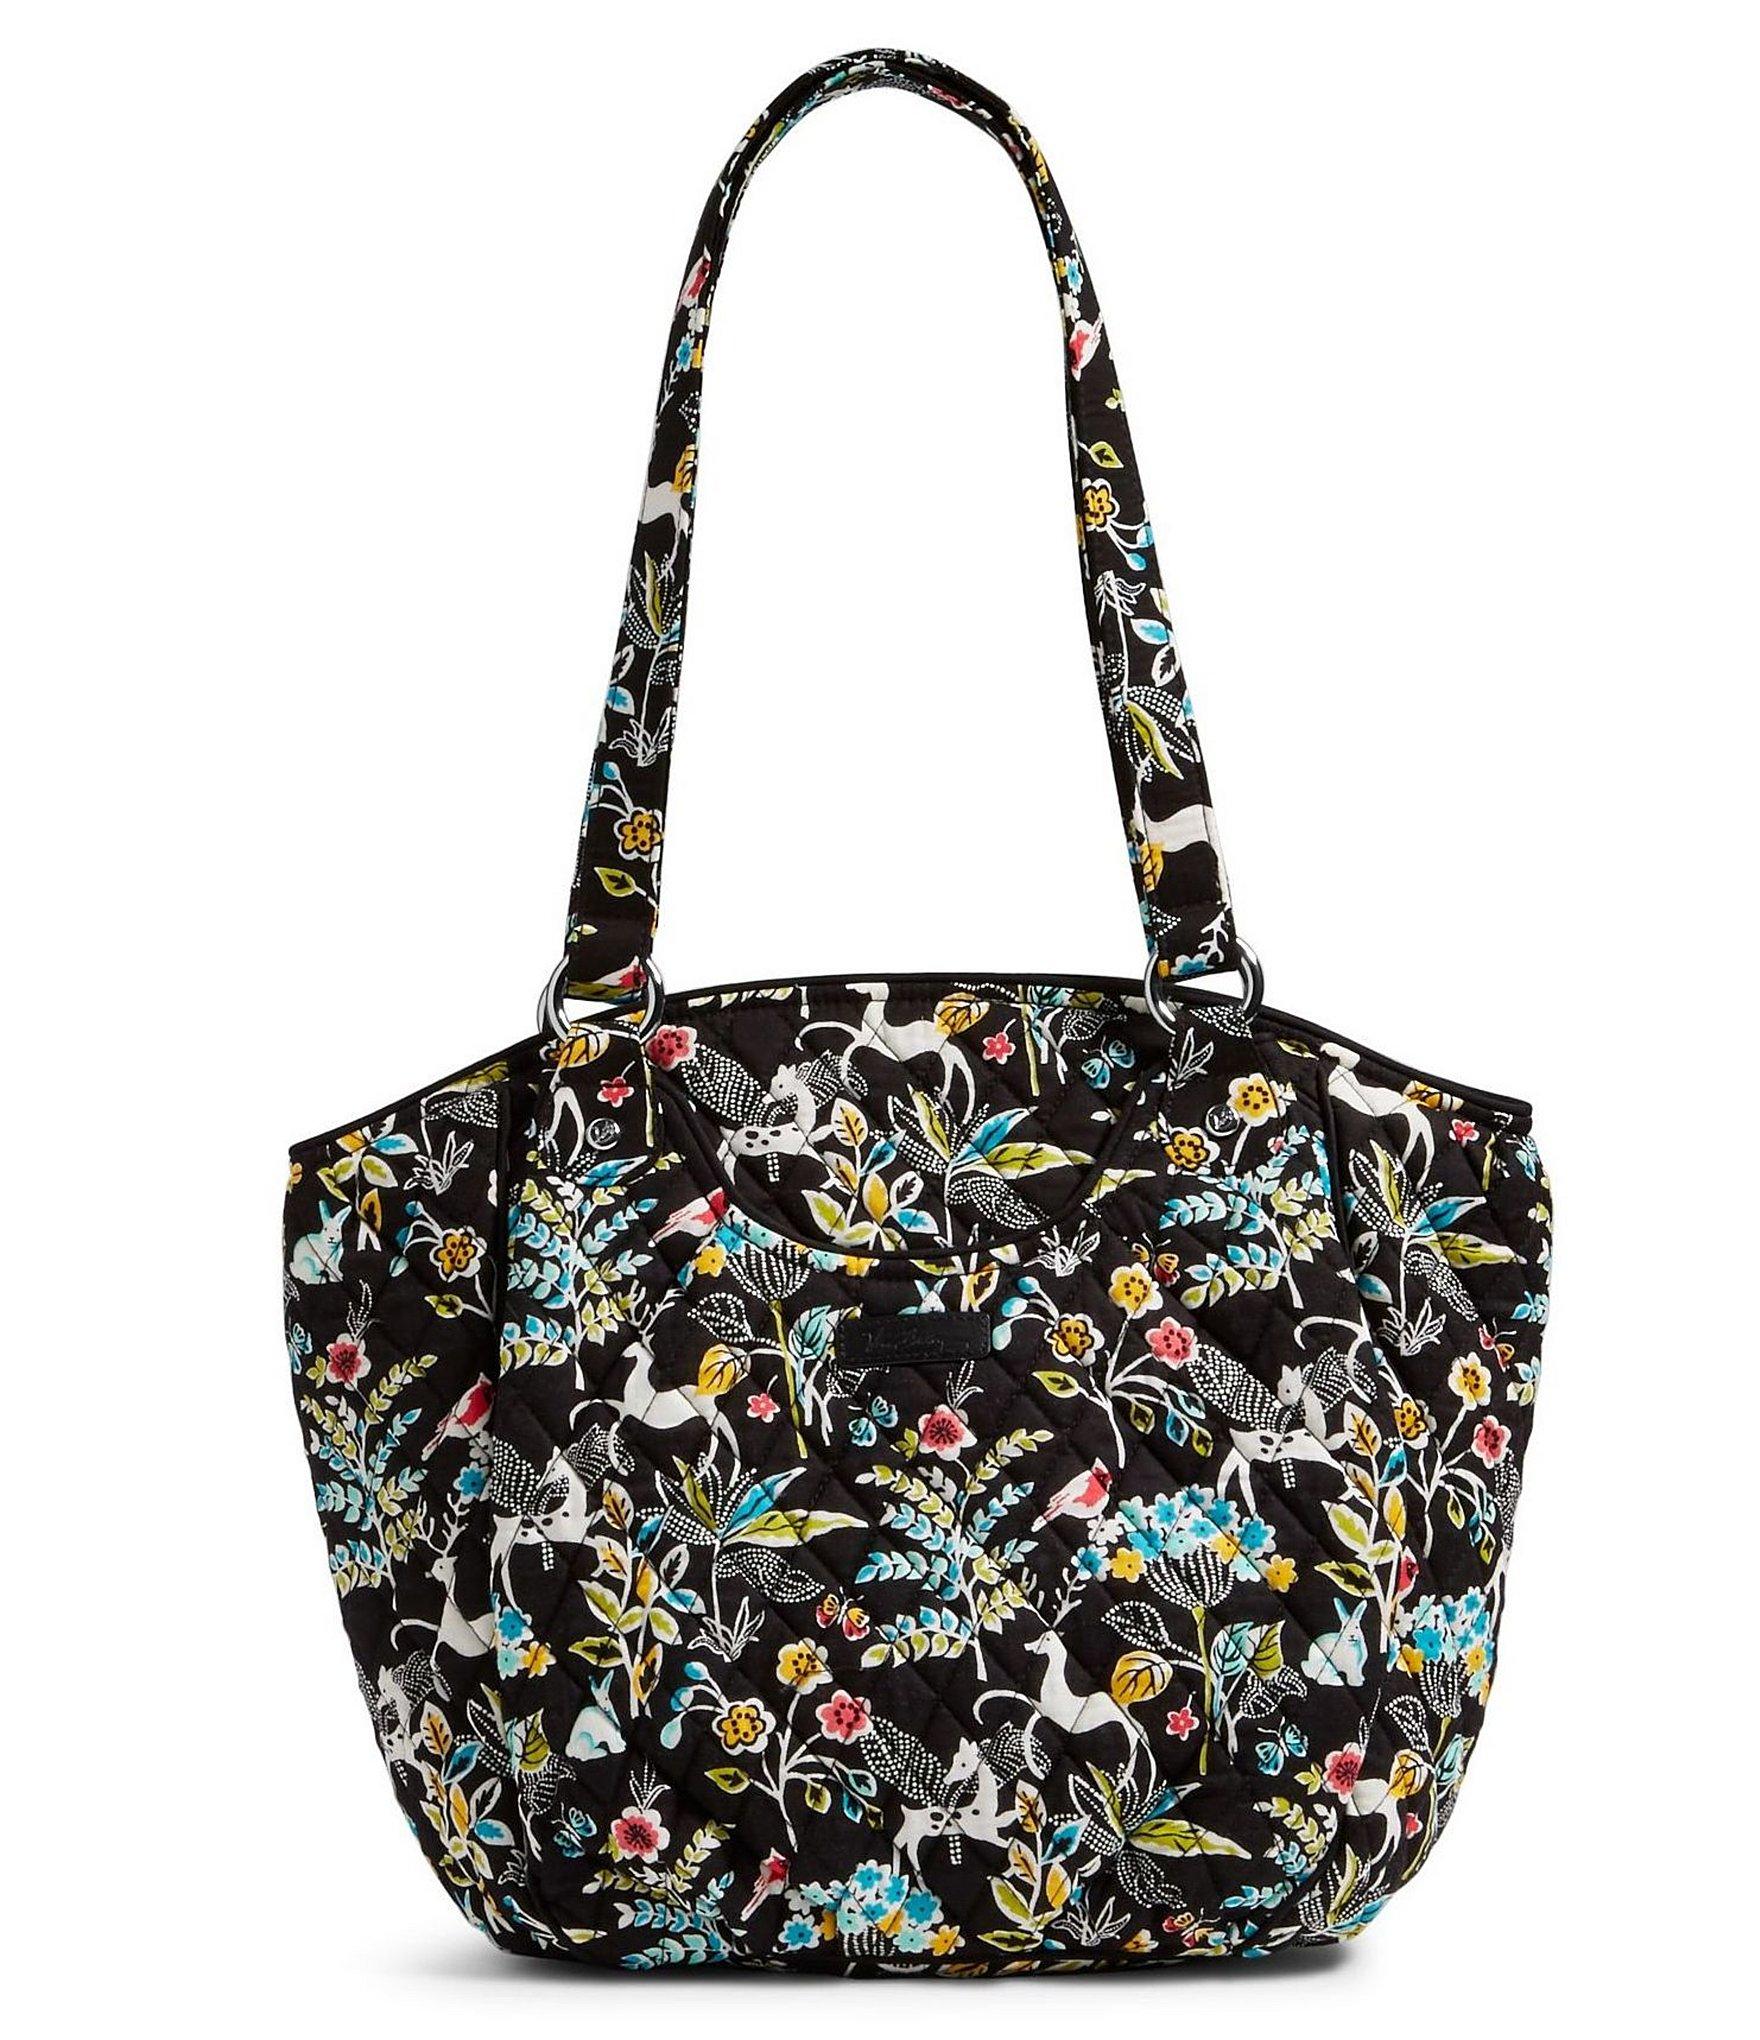 Lyst - Vera Bradley Glenna Shoulder Bag in Black